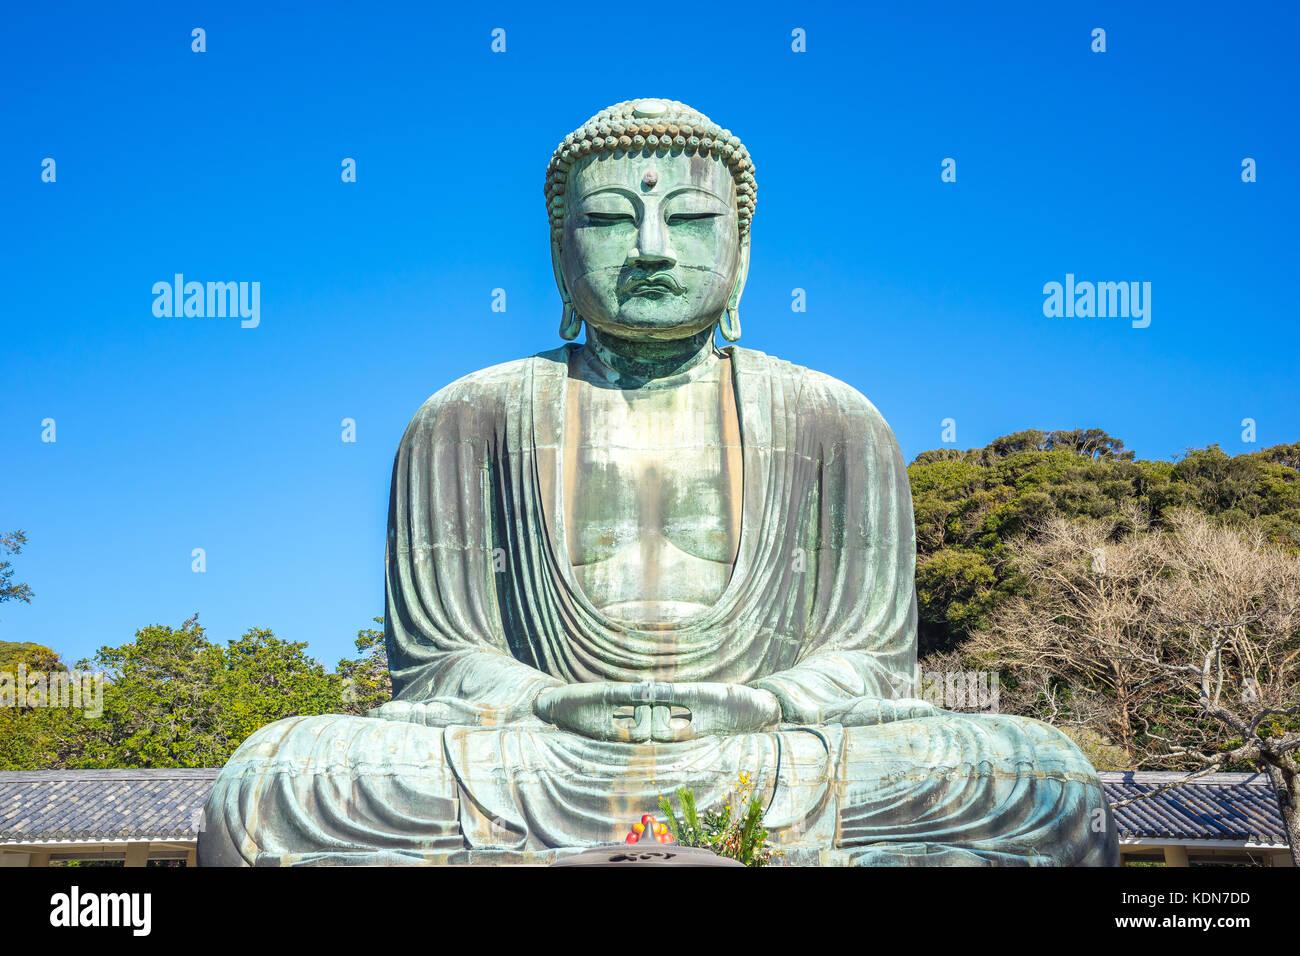 Daibutsu the great buddha at kotokuin temple in Kamakura, Kanagawa Prefecture, Japan. - Stock Image